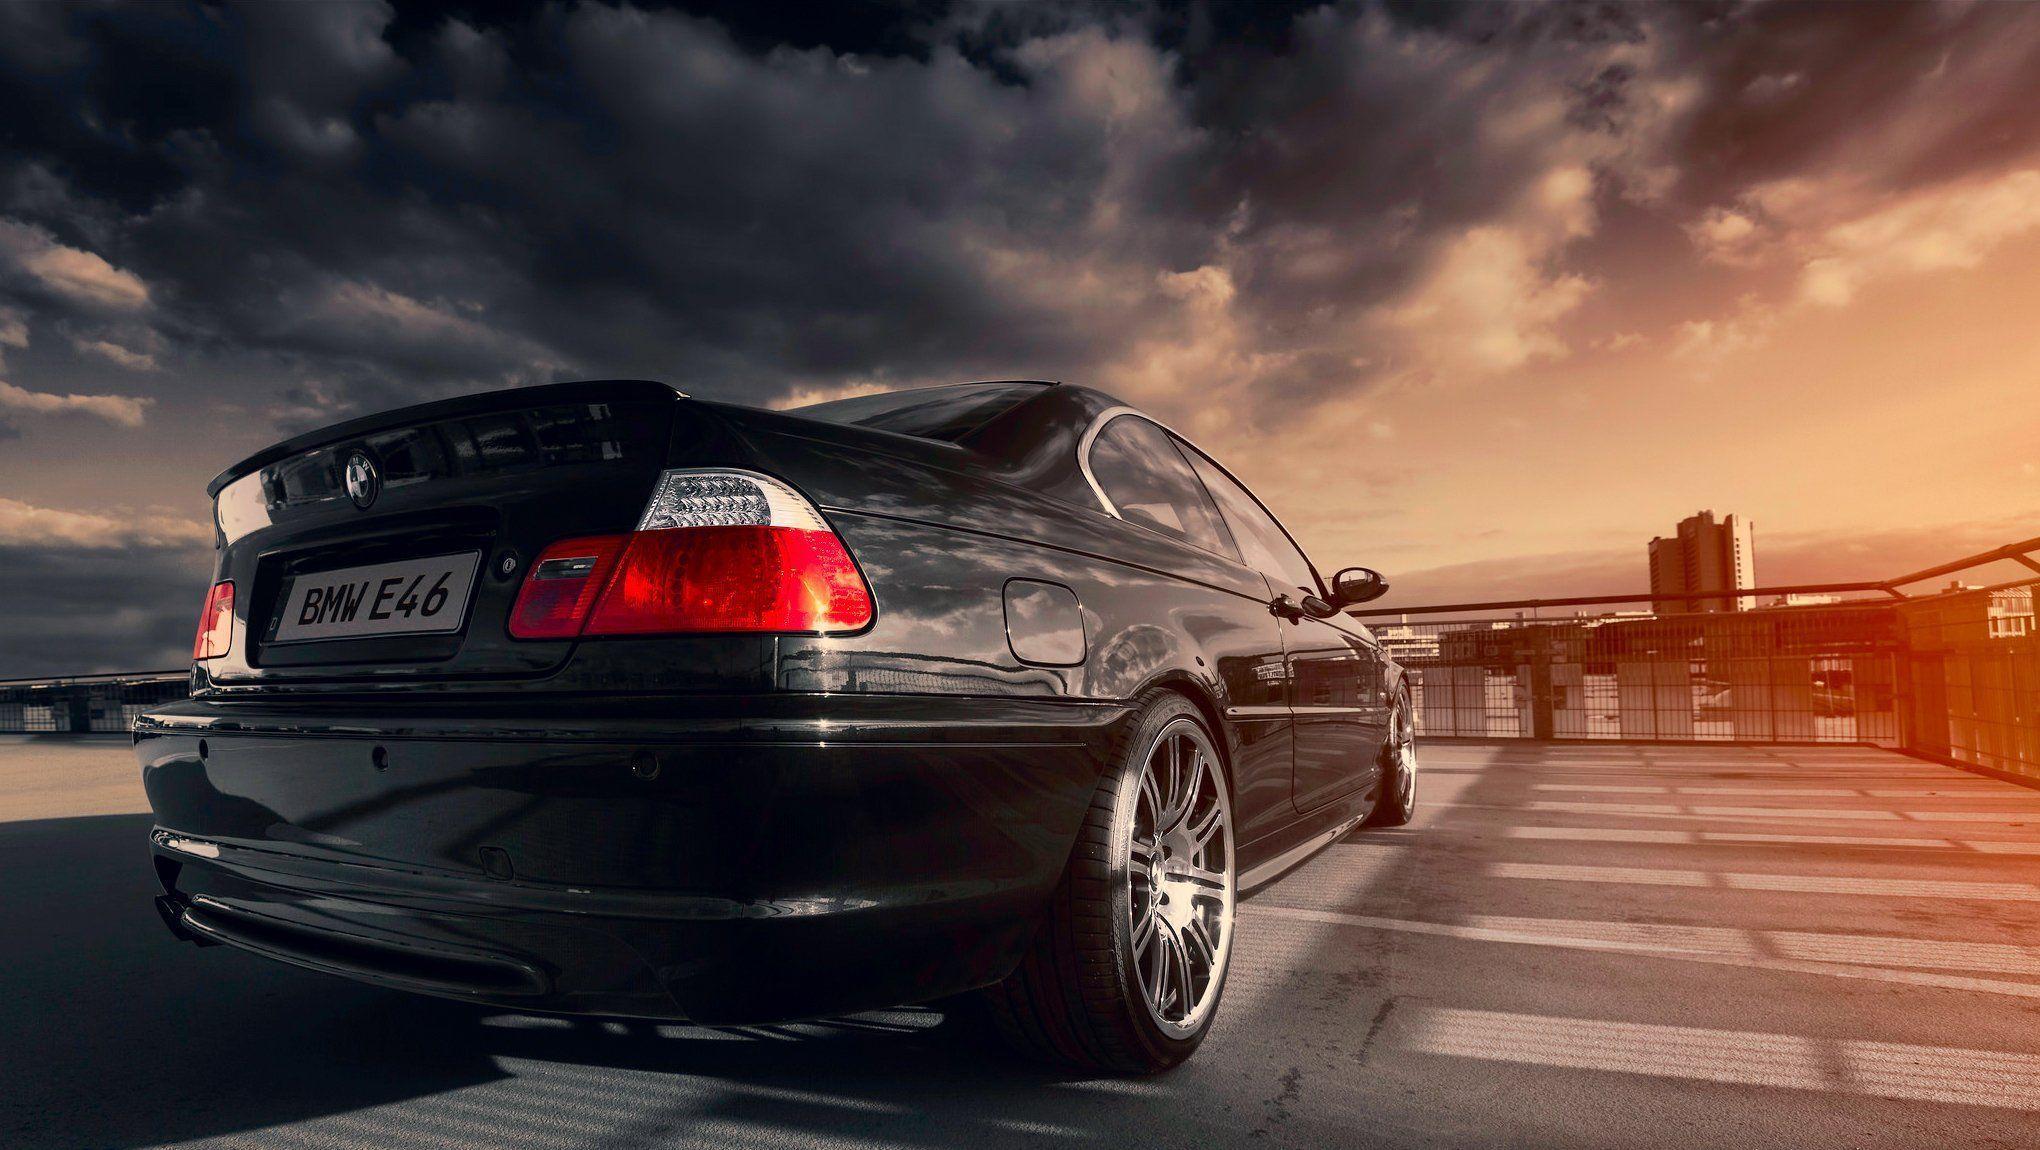 BMW E46 HD Wallpapers - Wallpaper Cave